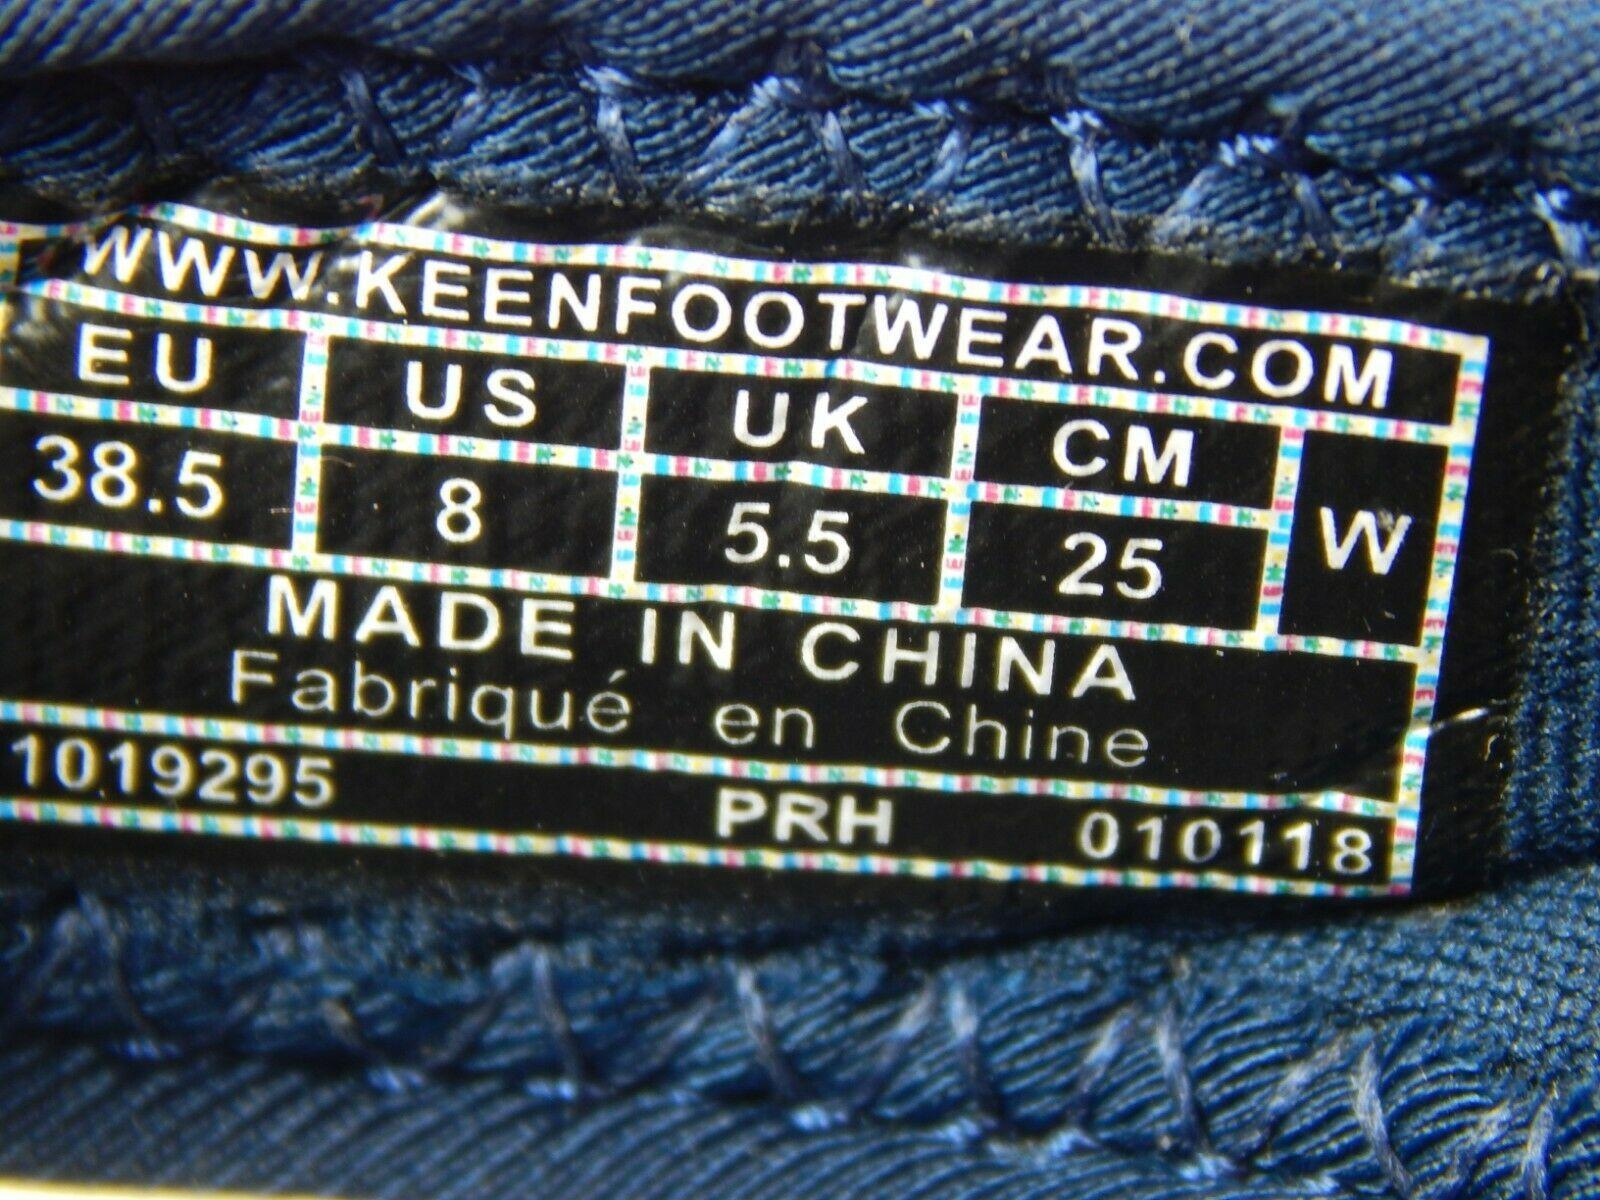 Keen Kona Flip II Sz US 8M (B) Eu 38.5 Mujer Sport Sandalias Azul/Verde 1019295